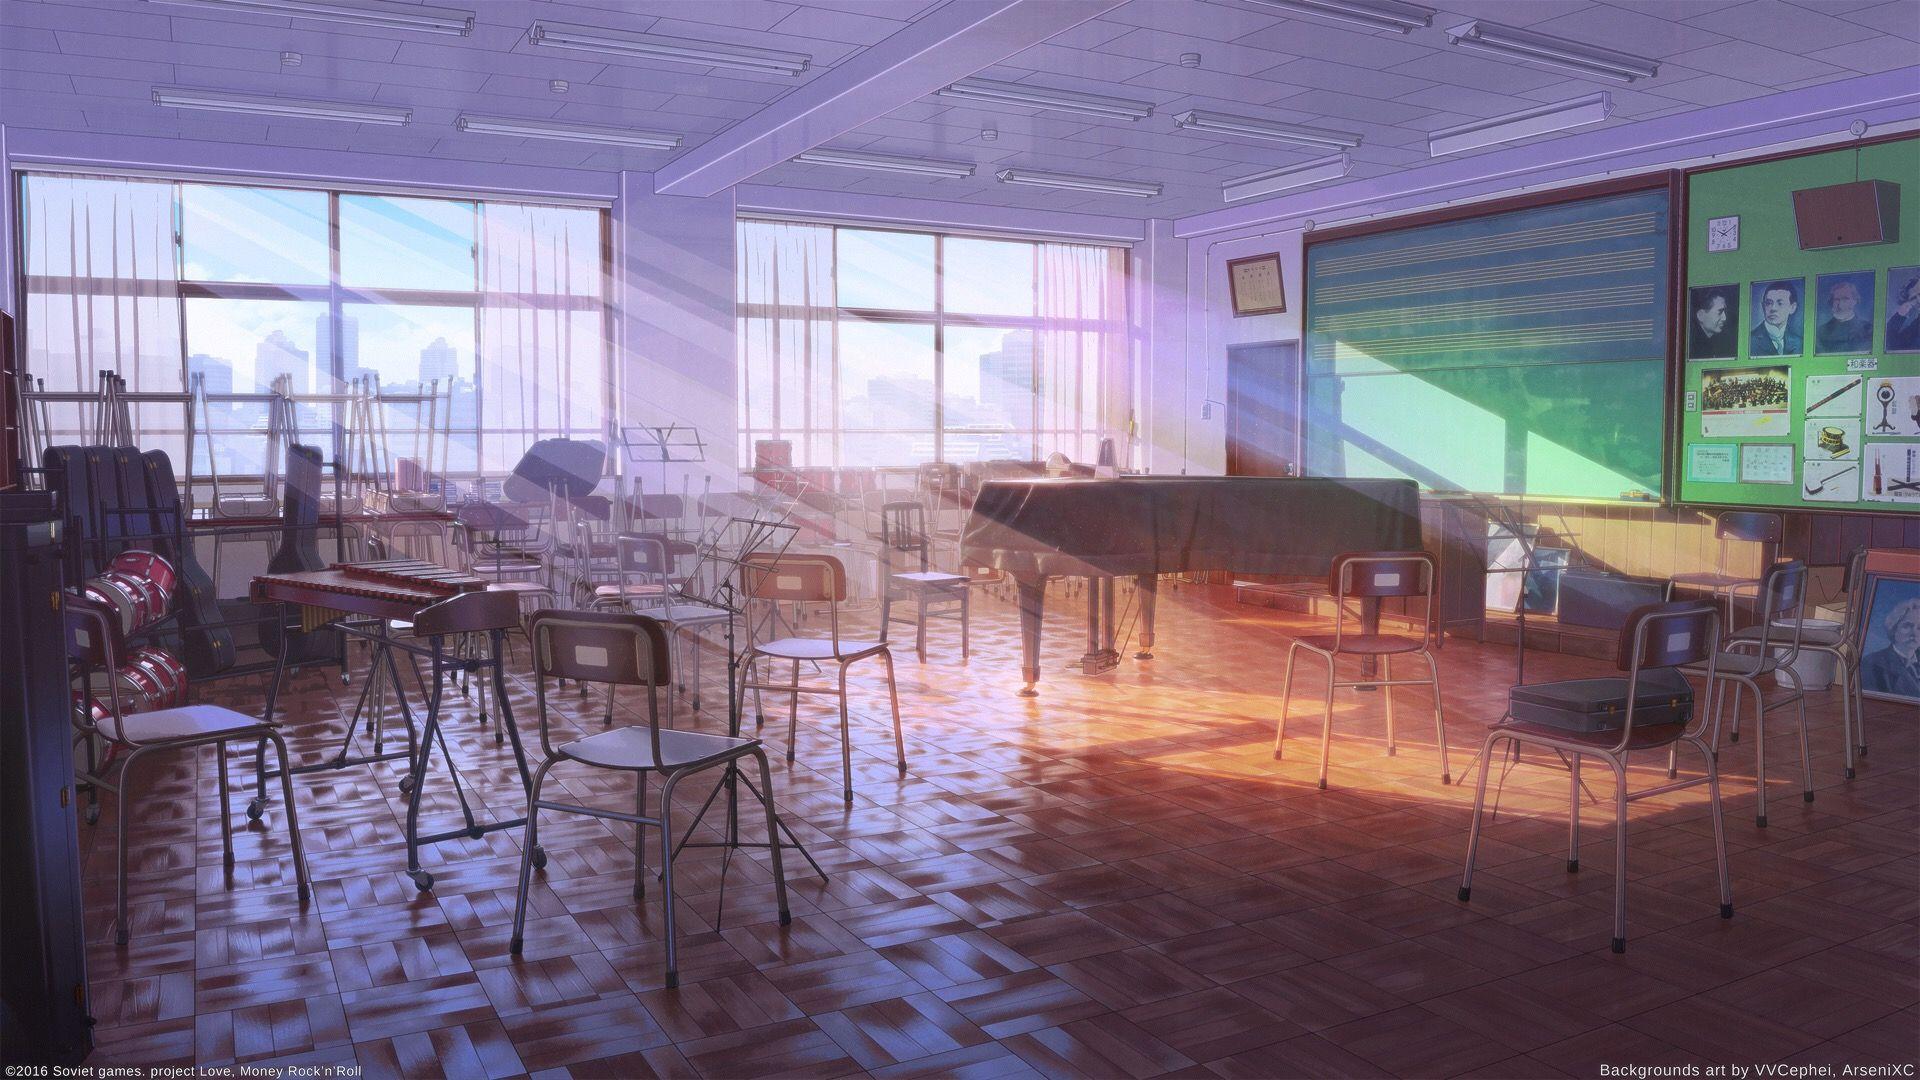 Anime / Manga Classroom Background Music Instruments Piano